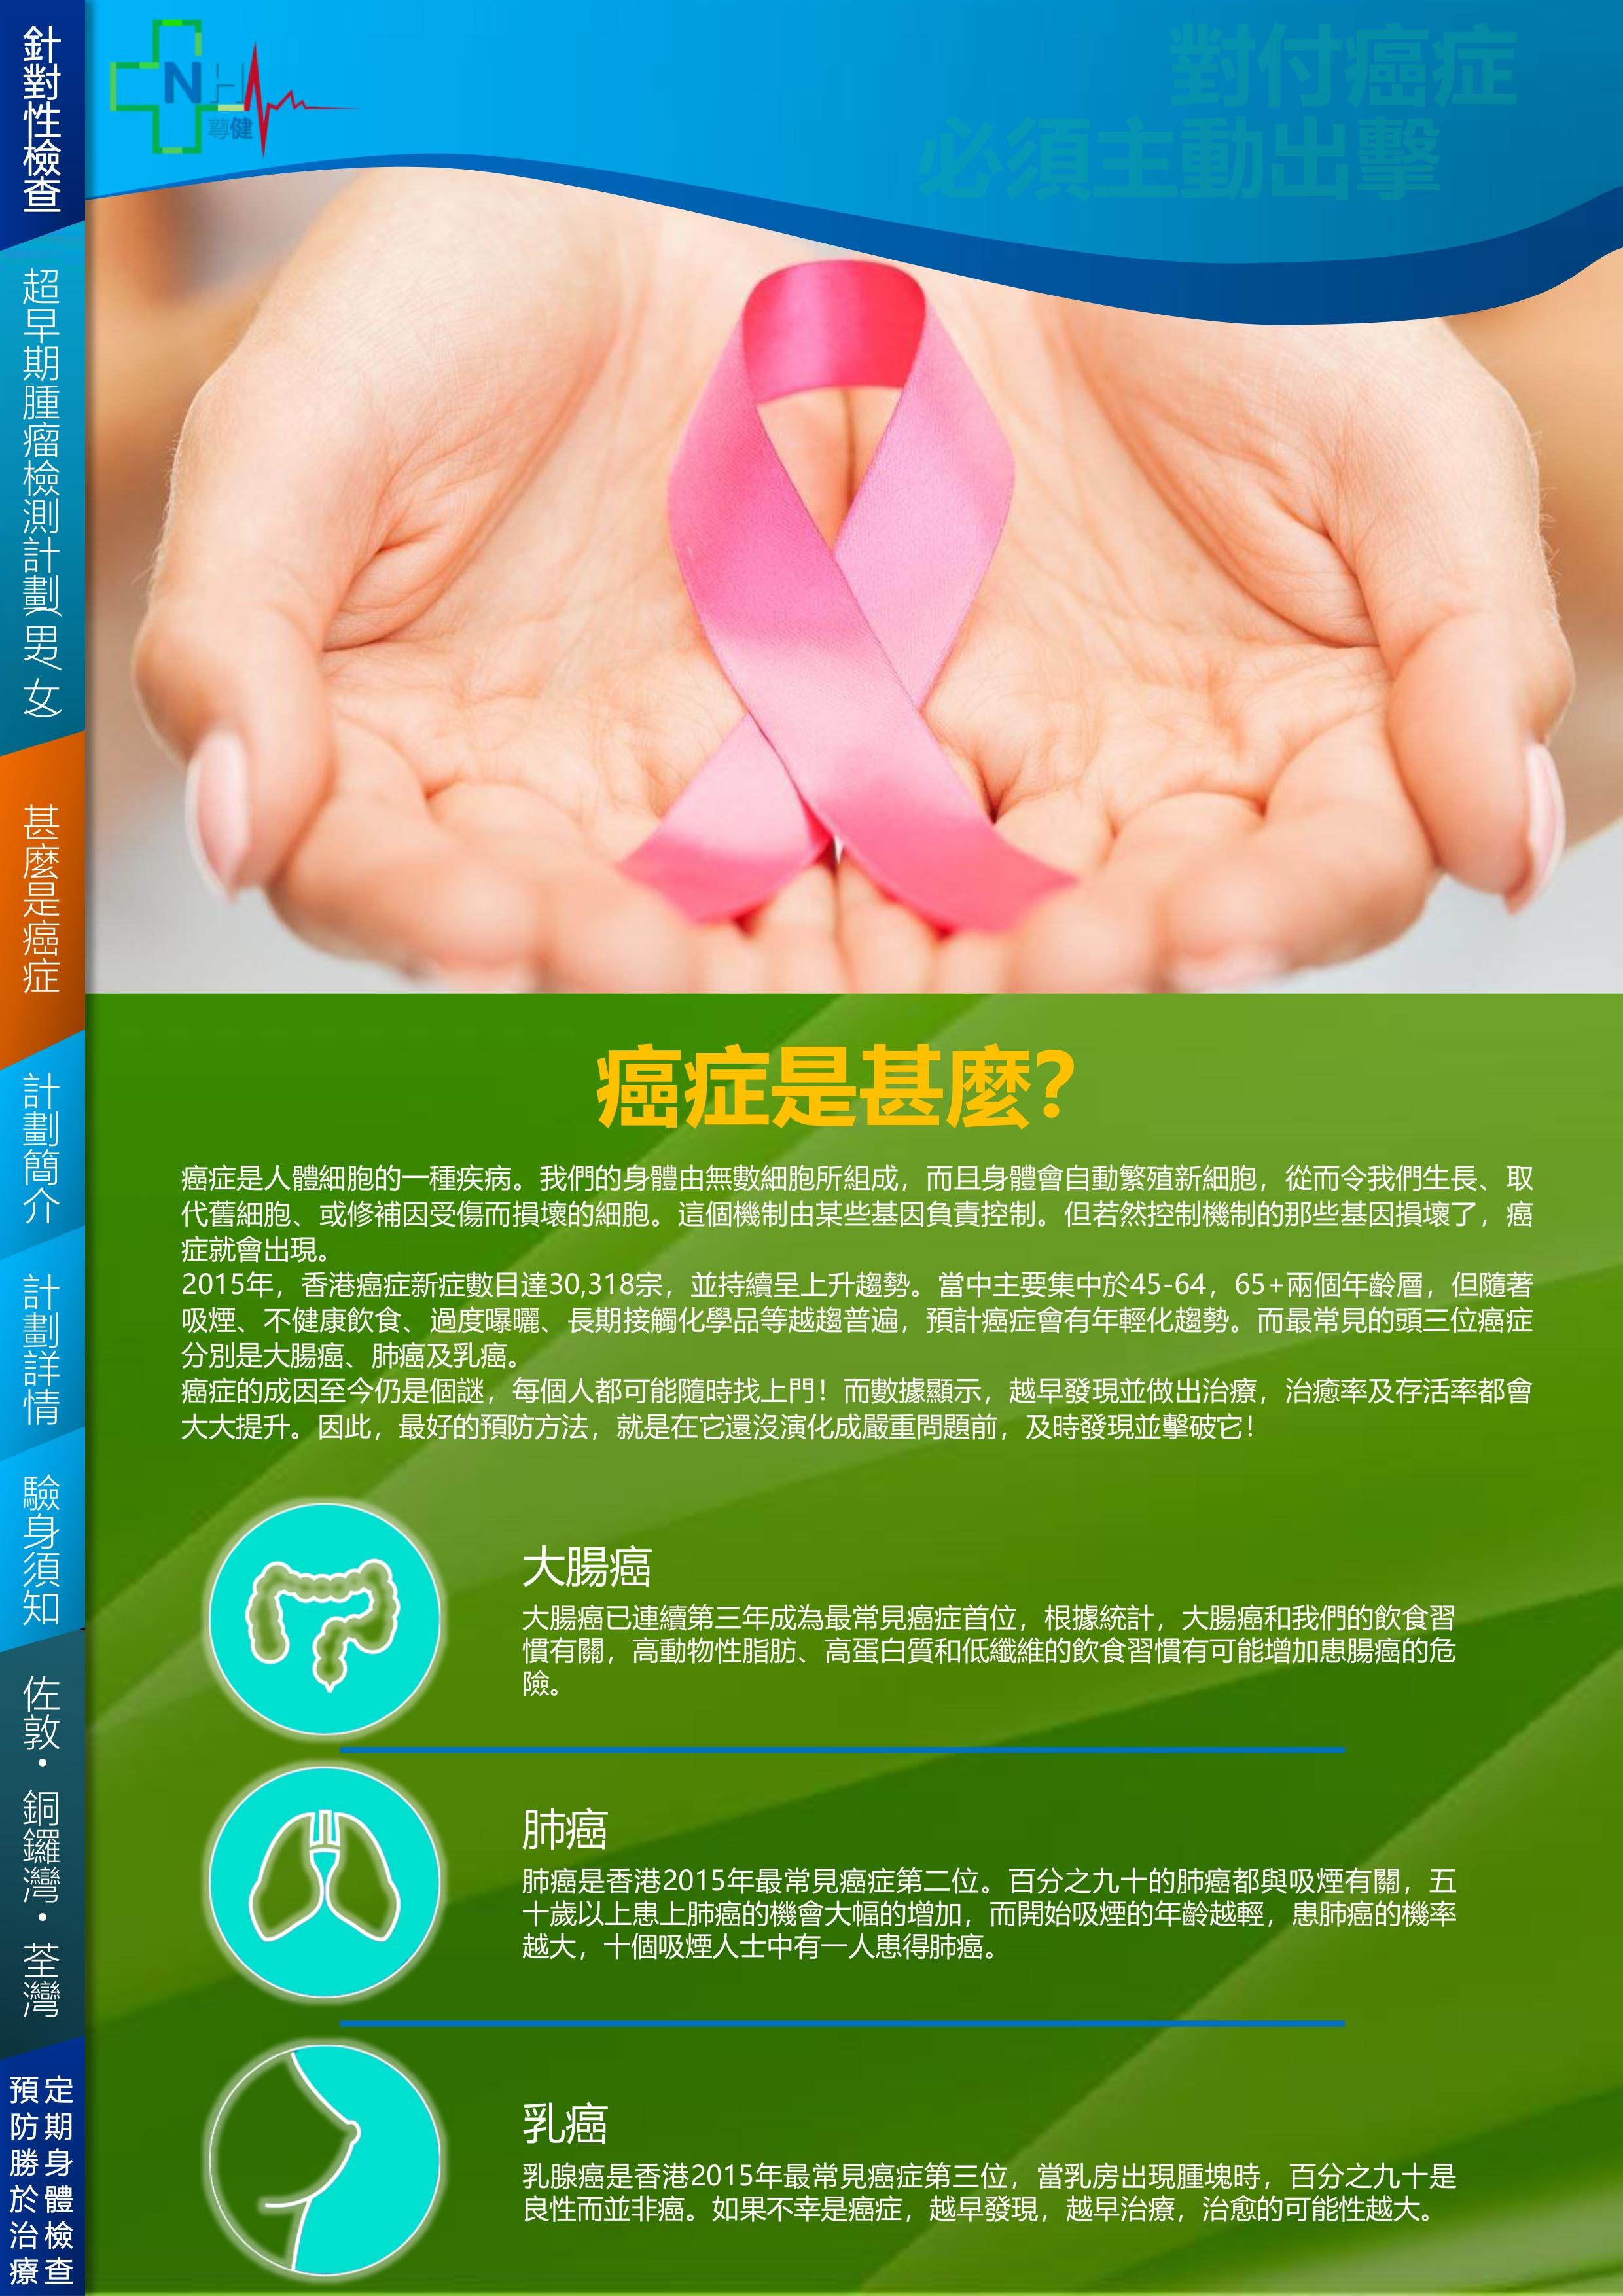 ccm-cancer-marker-2.jpg